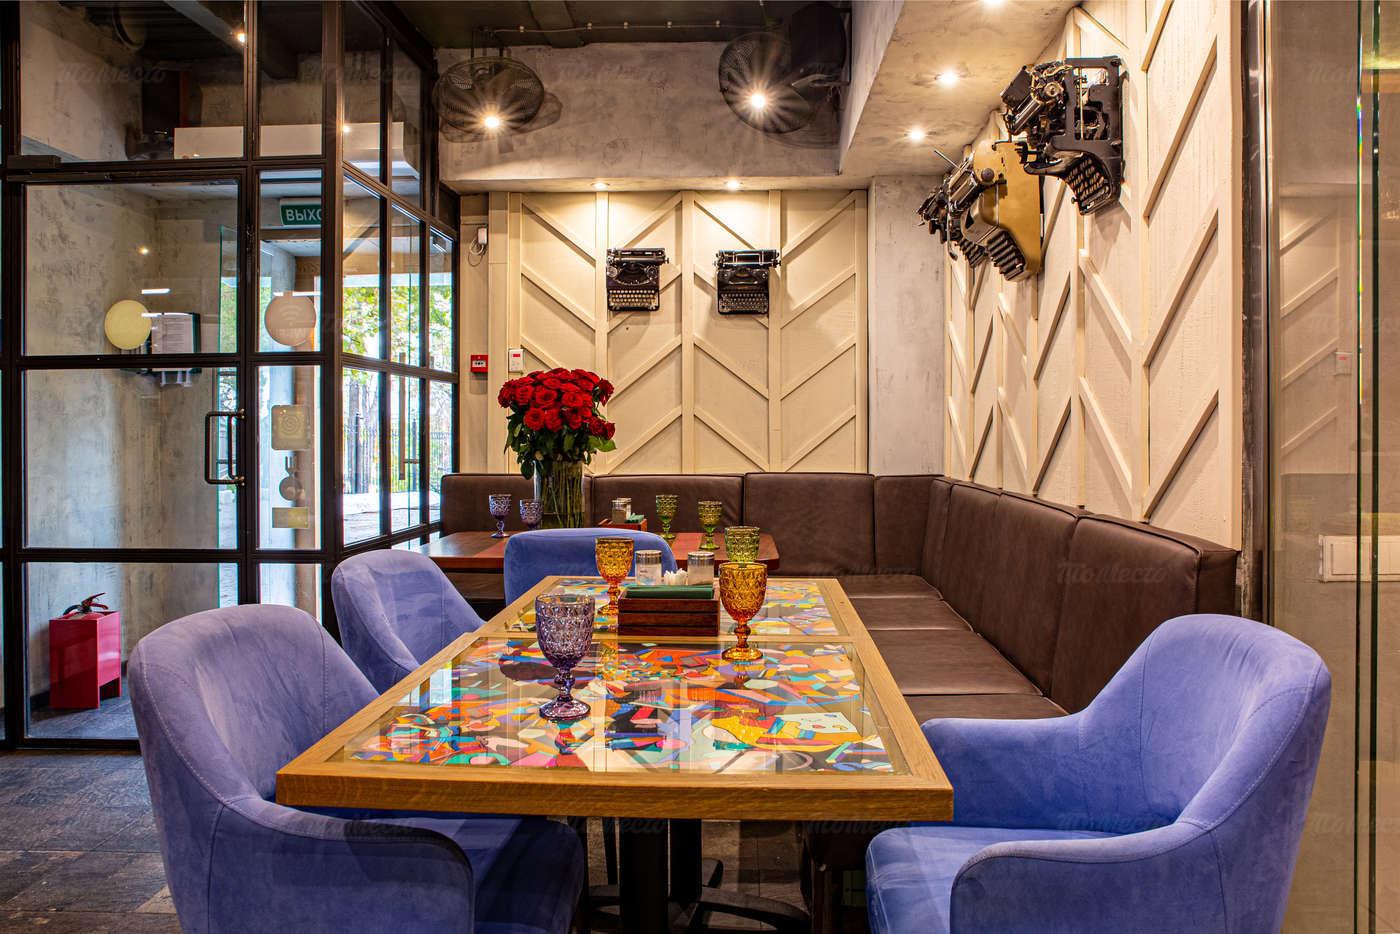 Ресторан IL LETTERATO (Литератор) в Петроверигском переулке фото 16